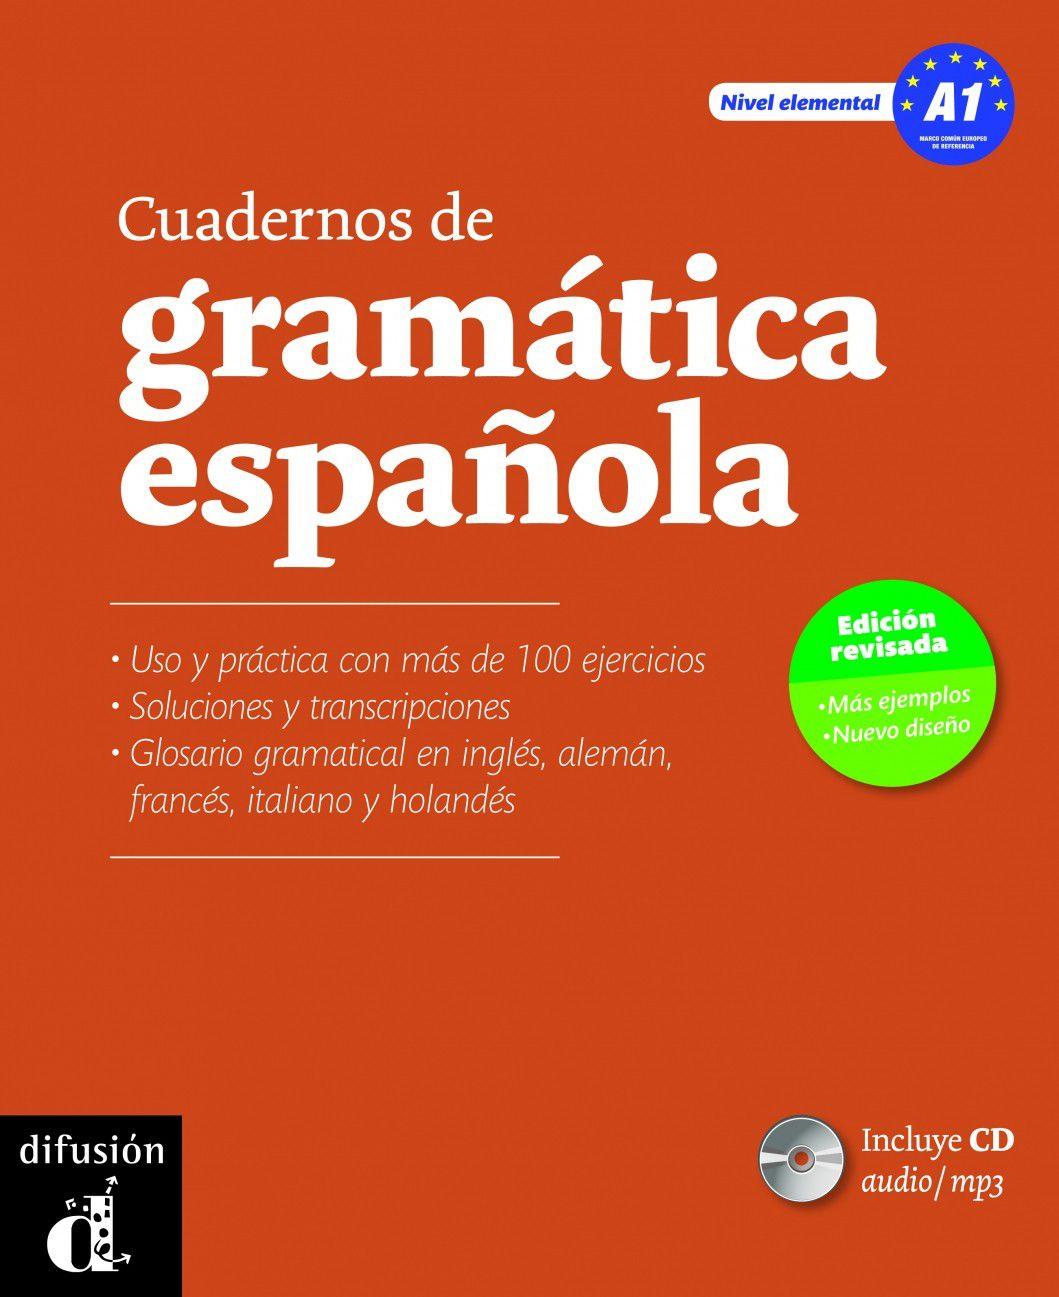 CUADERNOS DE GRAMATICA ESPANOLA A1